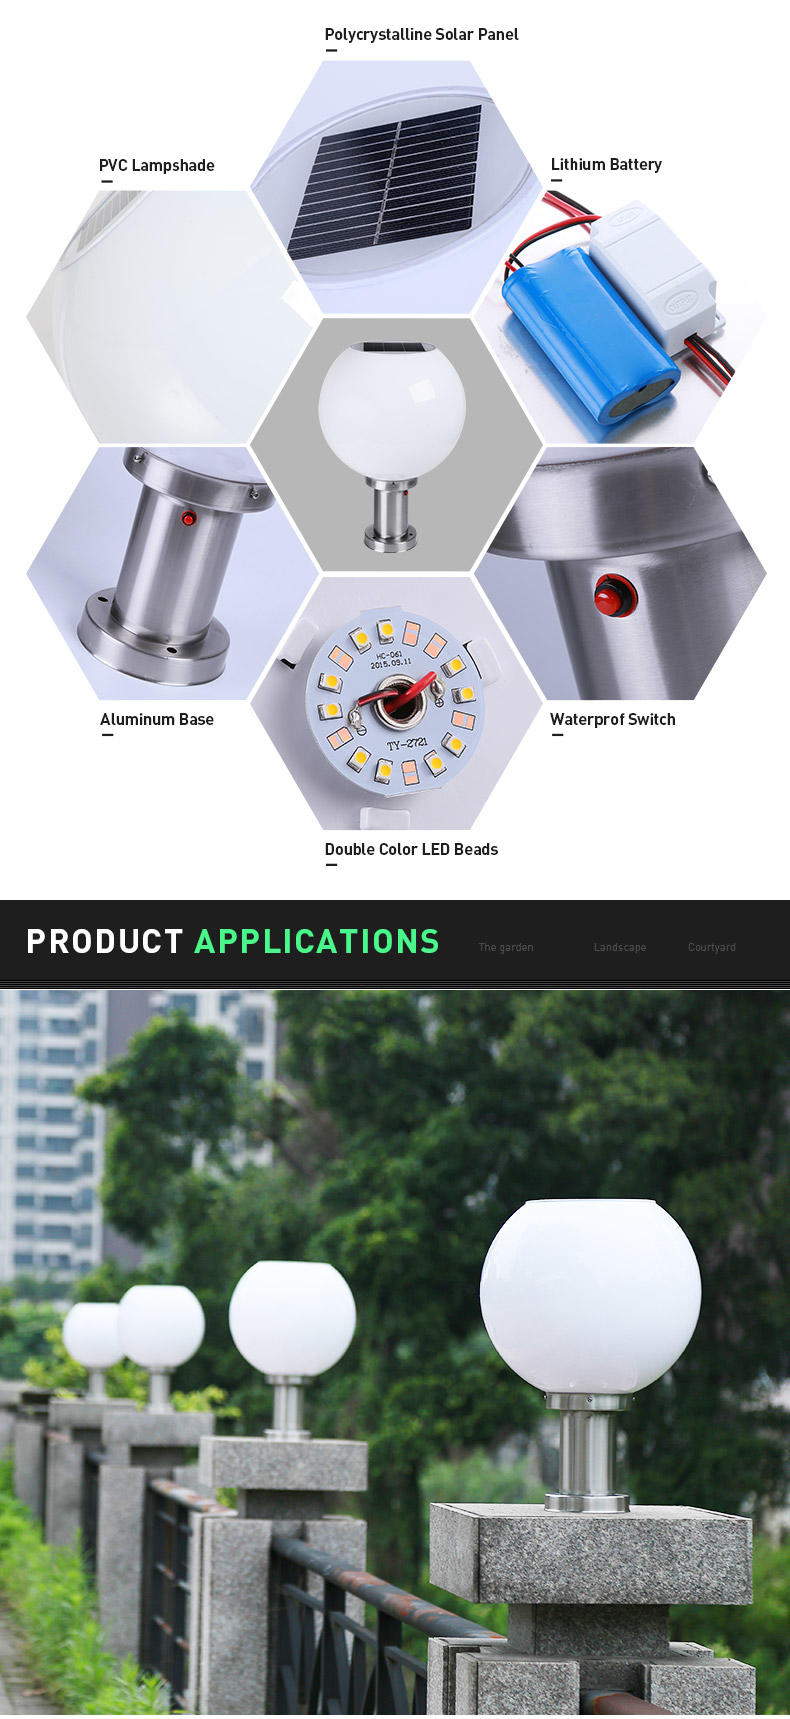 Pat Hei Gate Hardware sharp solar panels factory for sale